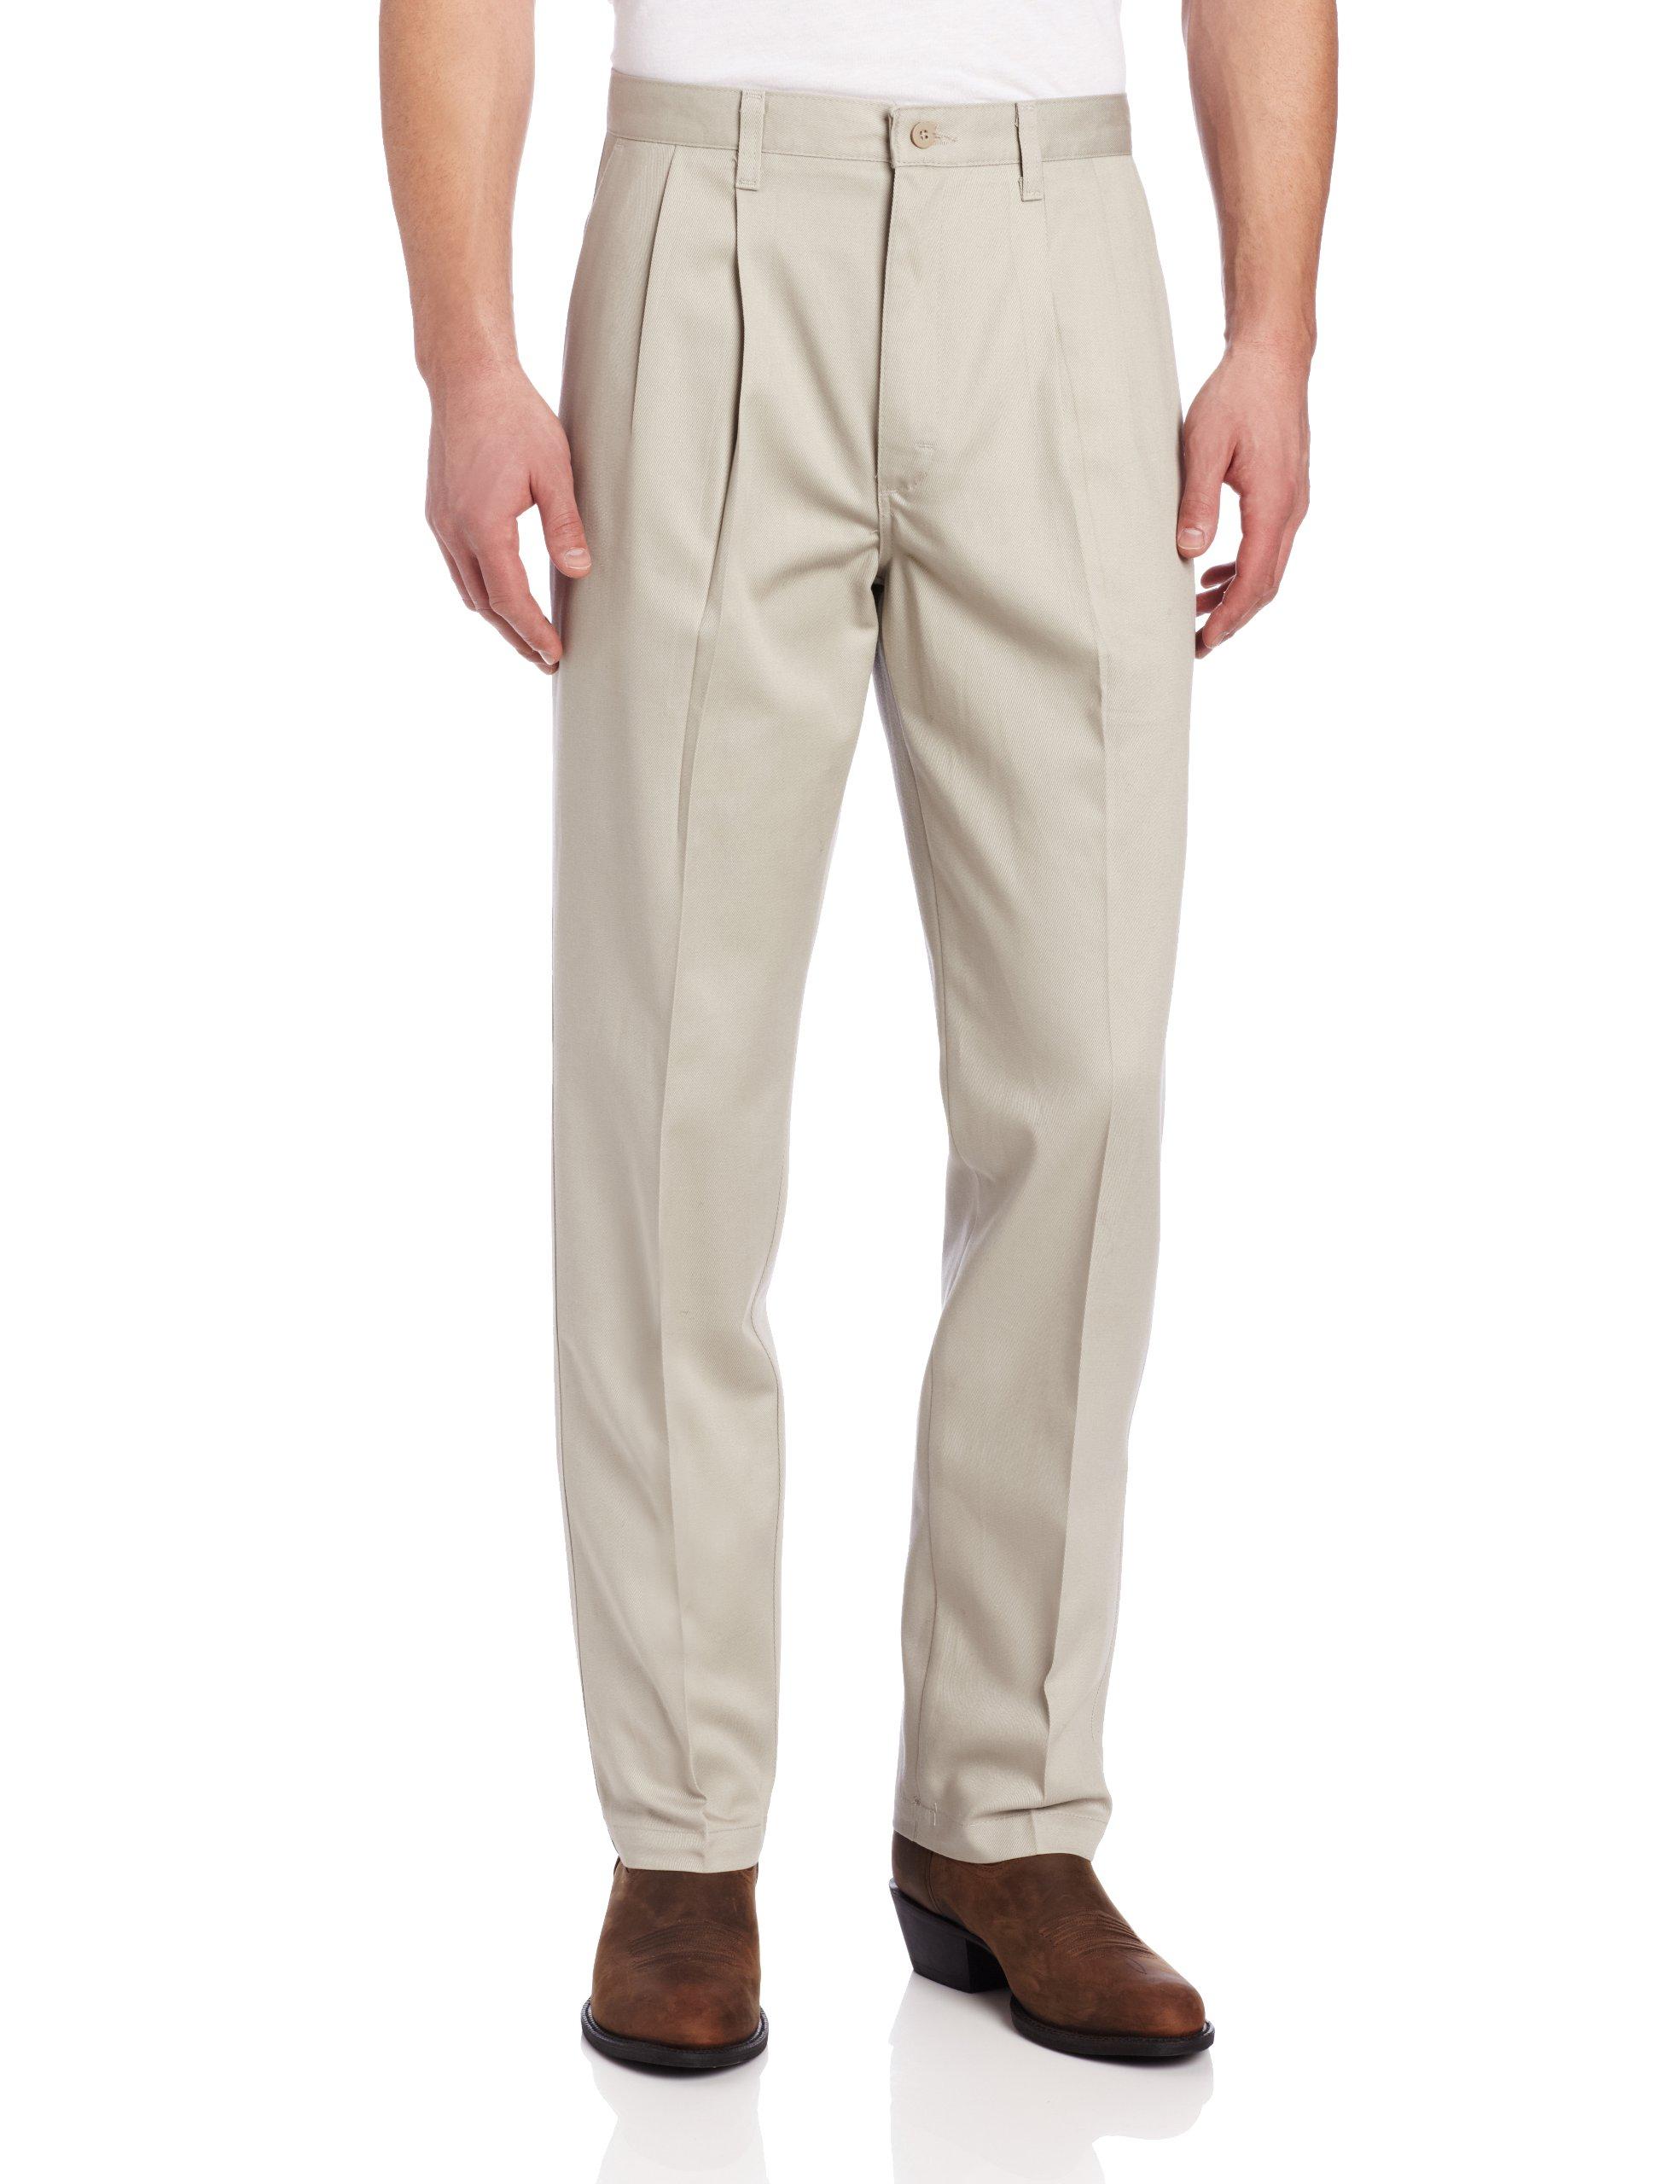 Wrangler Men's Tall Riata Pleat Front Twill Pant,Putty,32x38